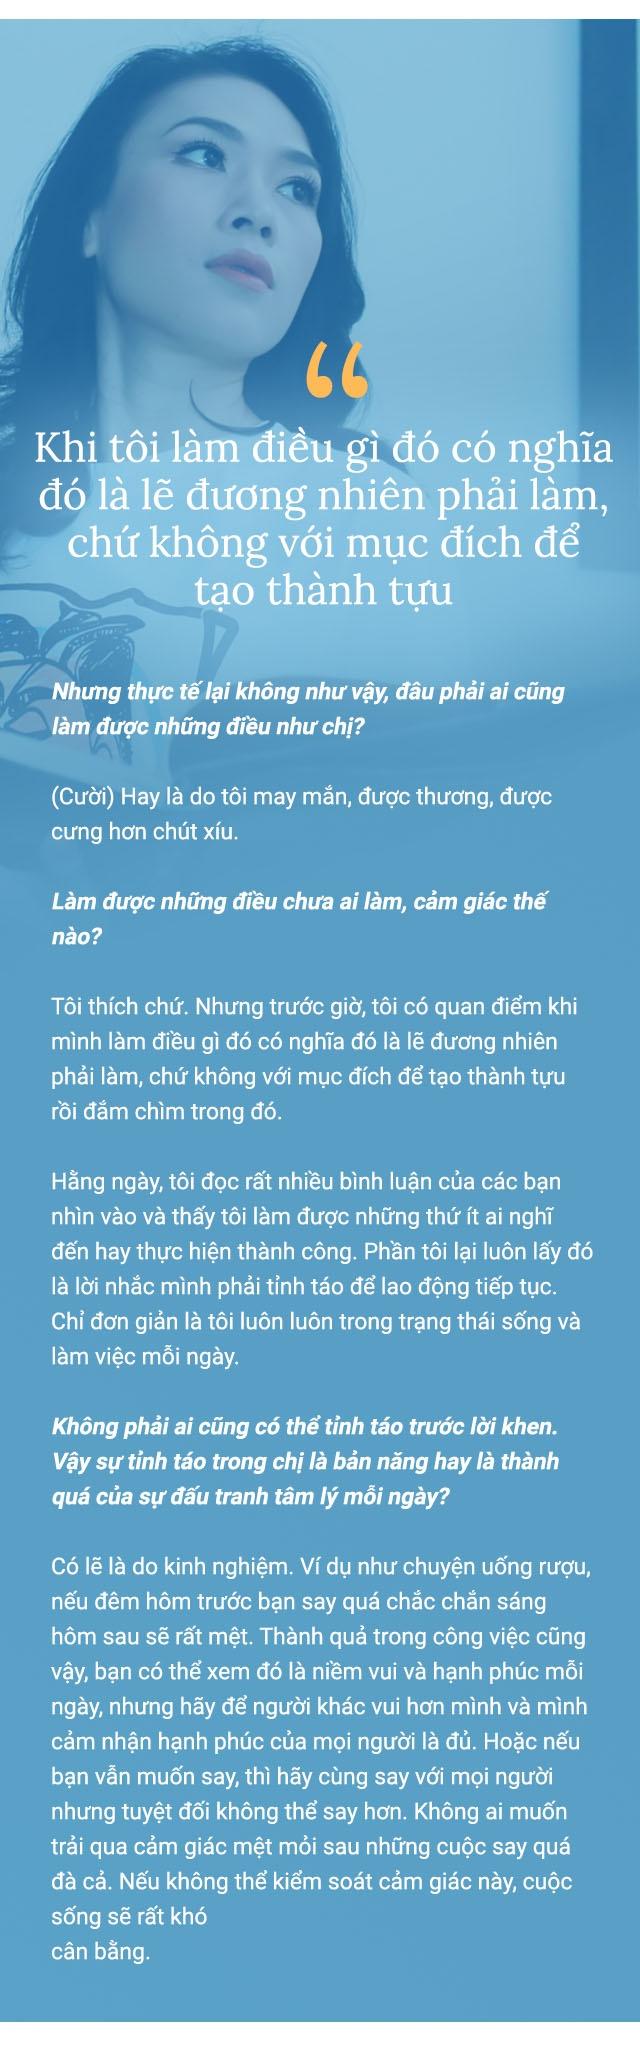 My Tam: 'Ca the gioi nhu sup do sau cuoc tinh khong tron ven' hinh anh 7